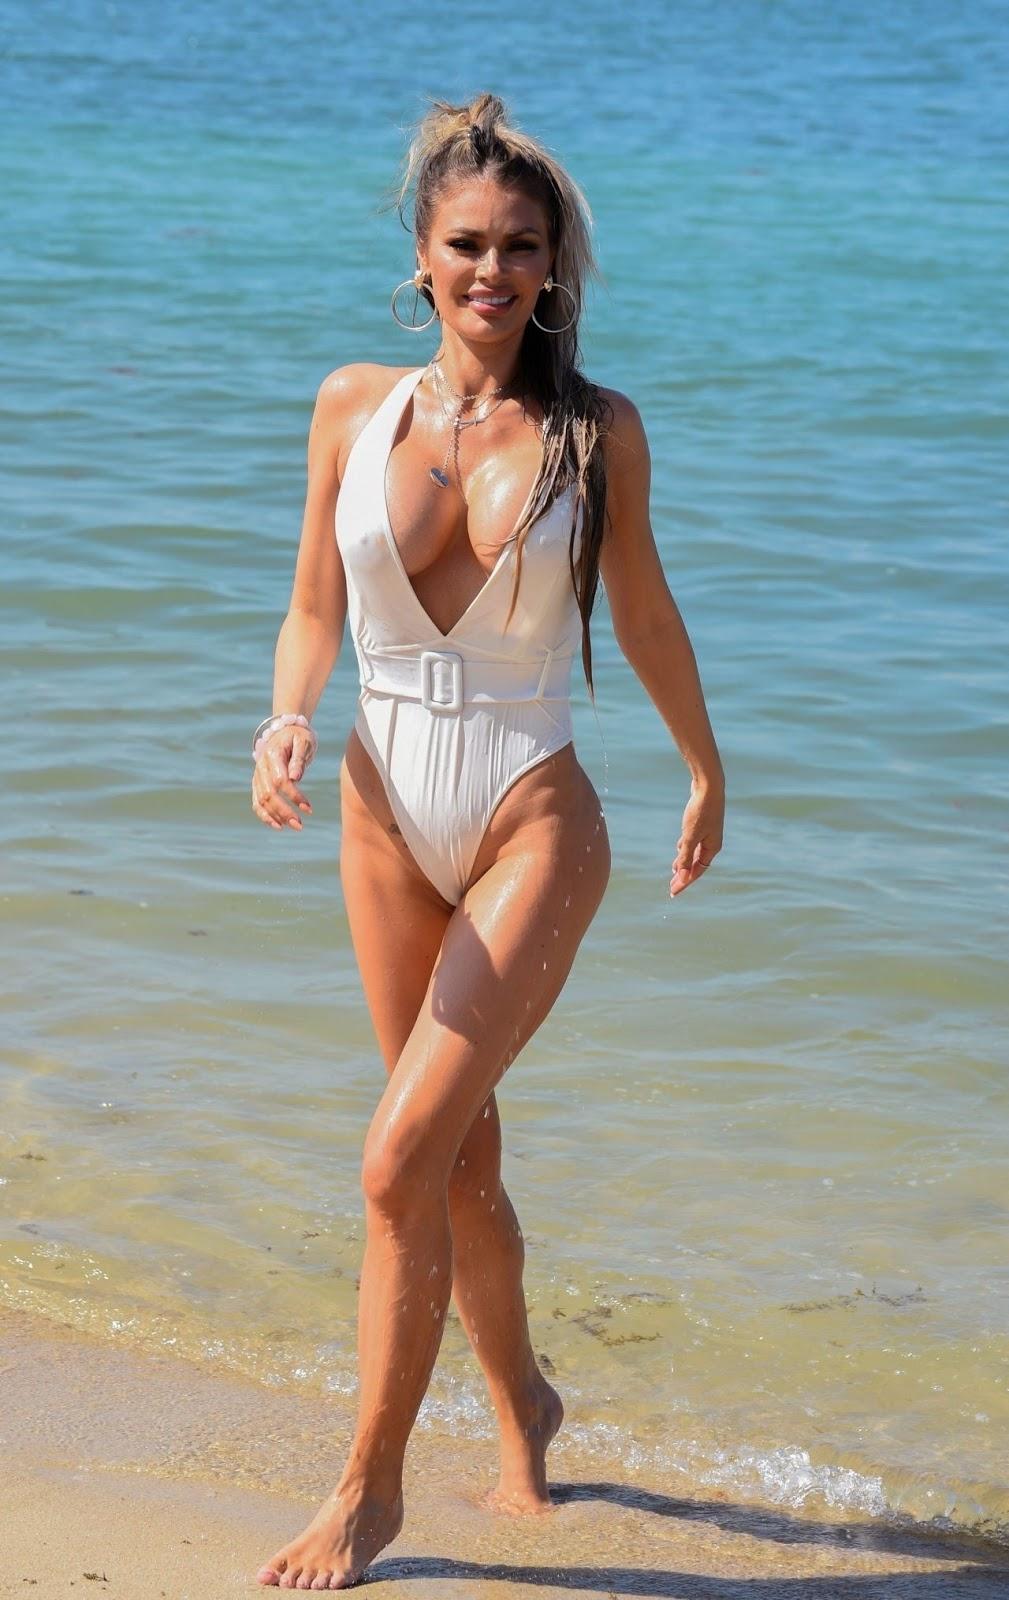 Chloe Sims in Swimsuit - 03/07/2019